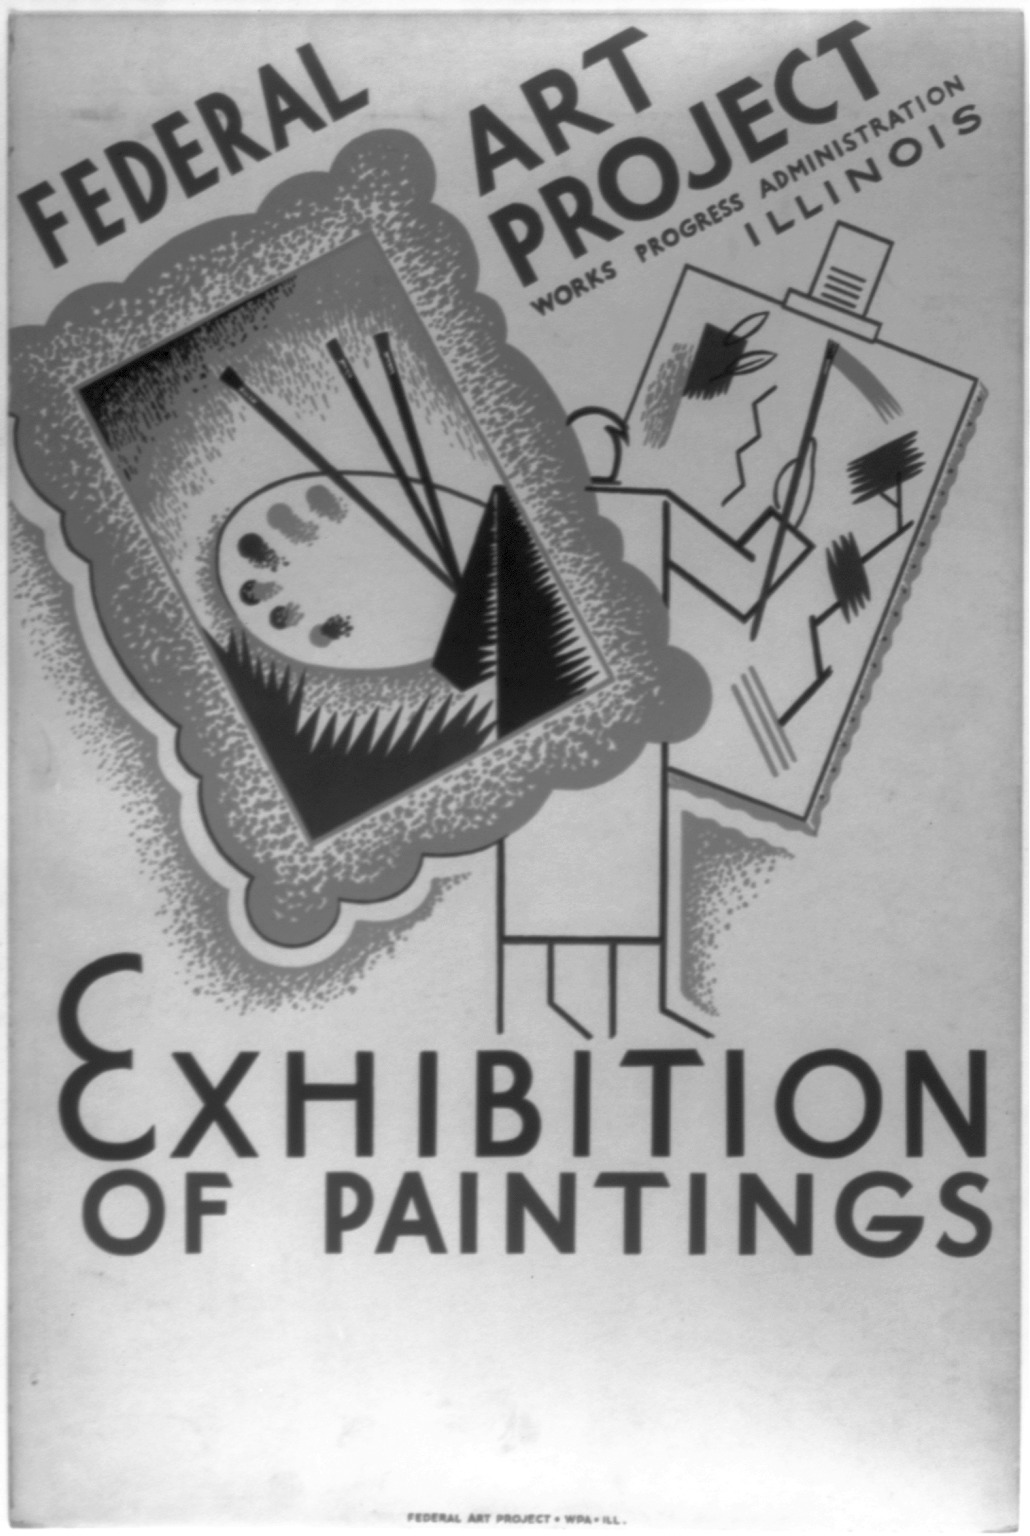 Description Of Federal Art Project